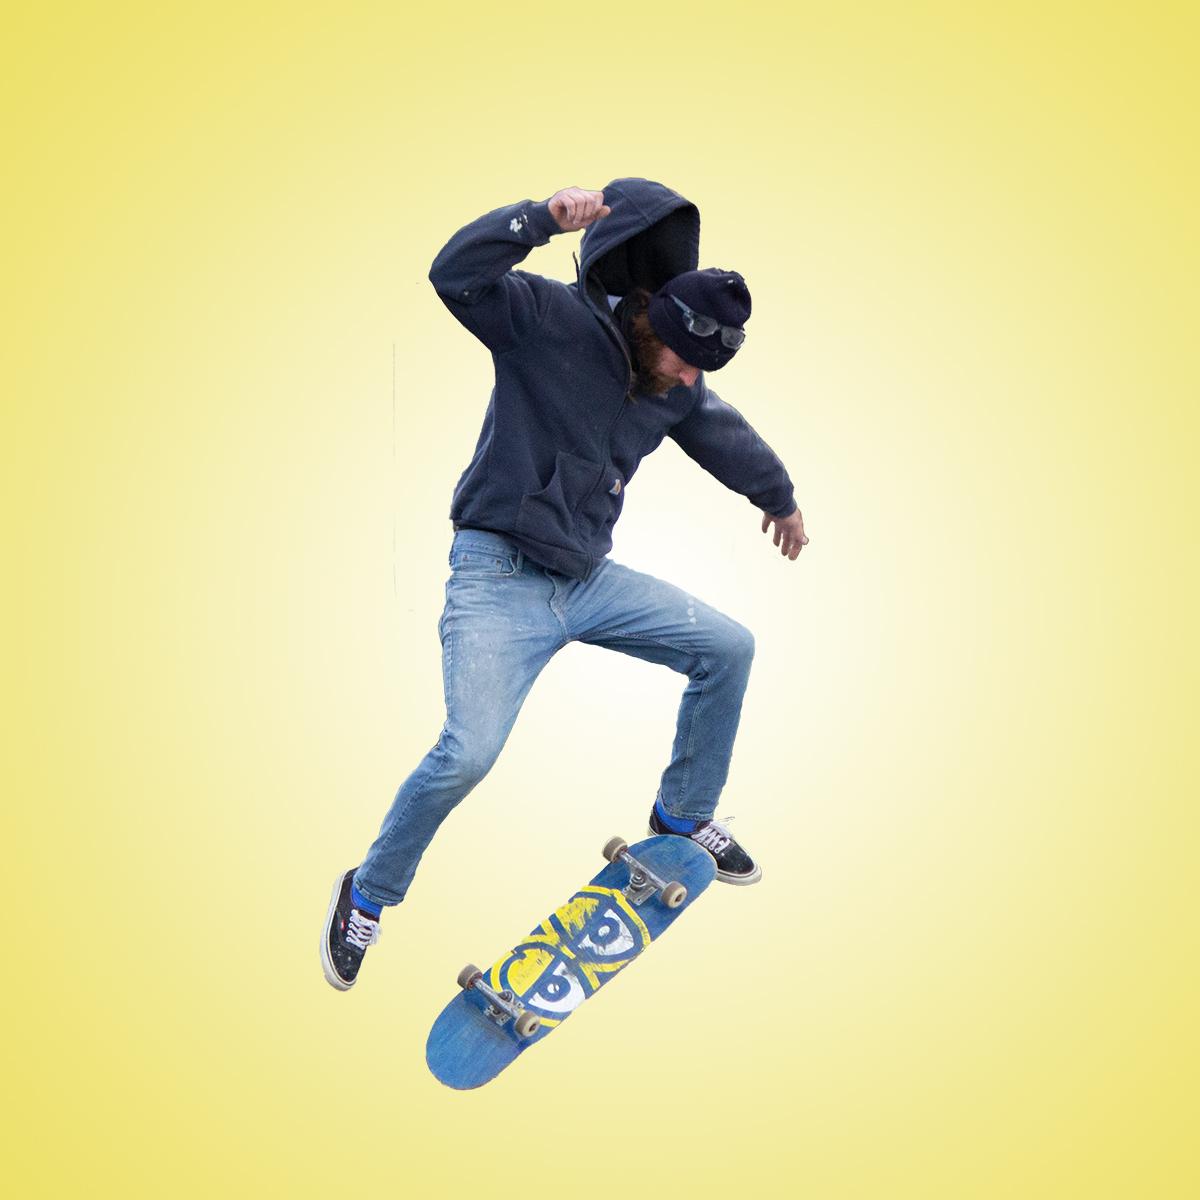 Edited Image of Skateboard Trick